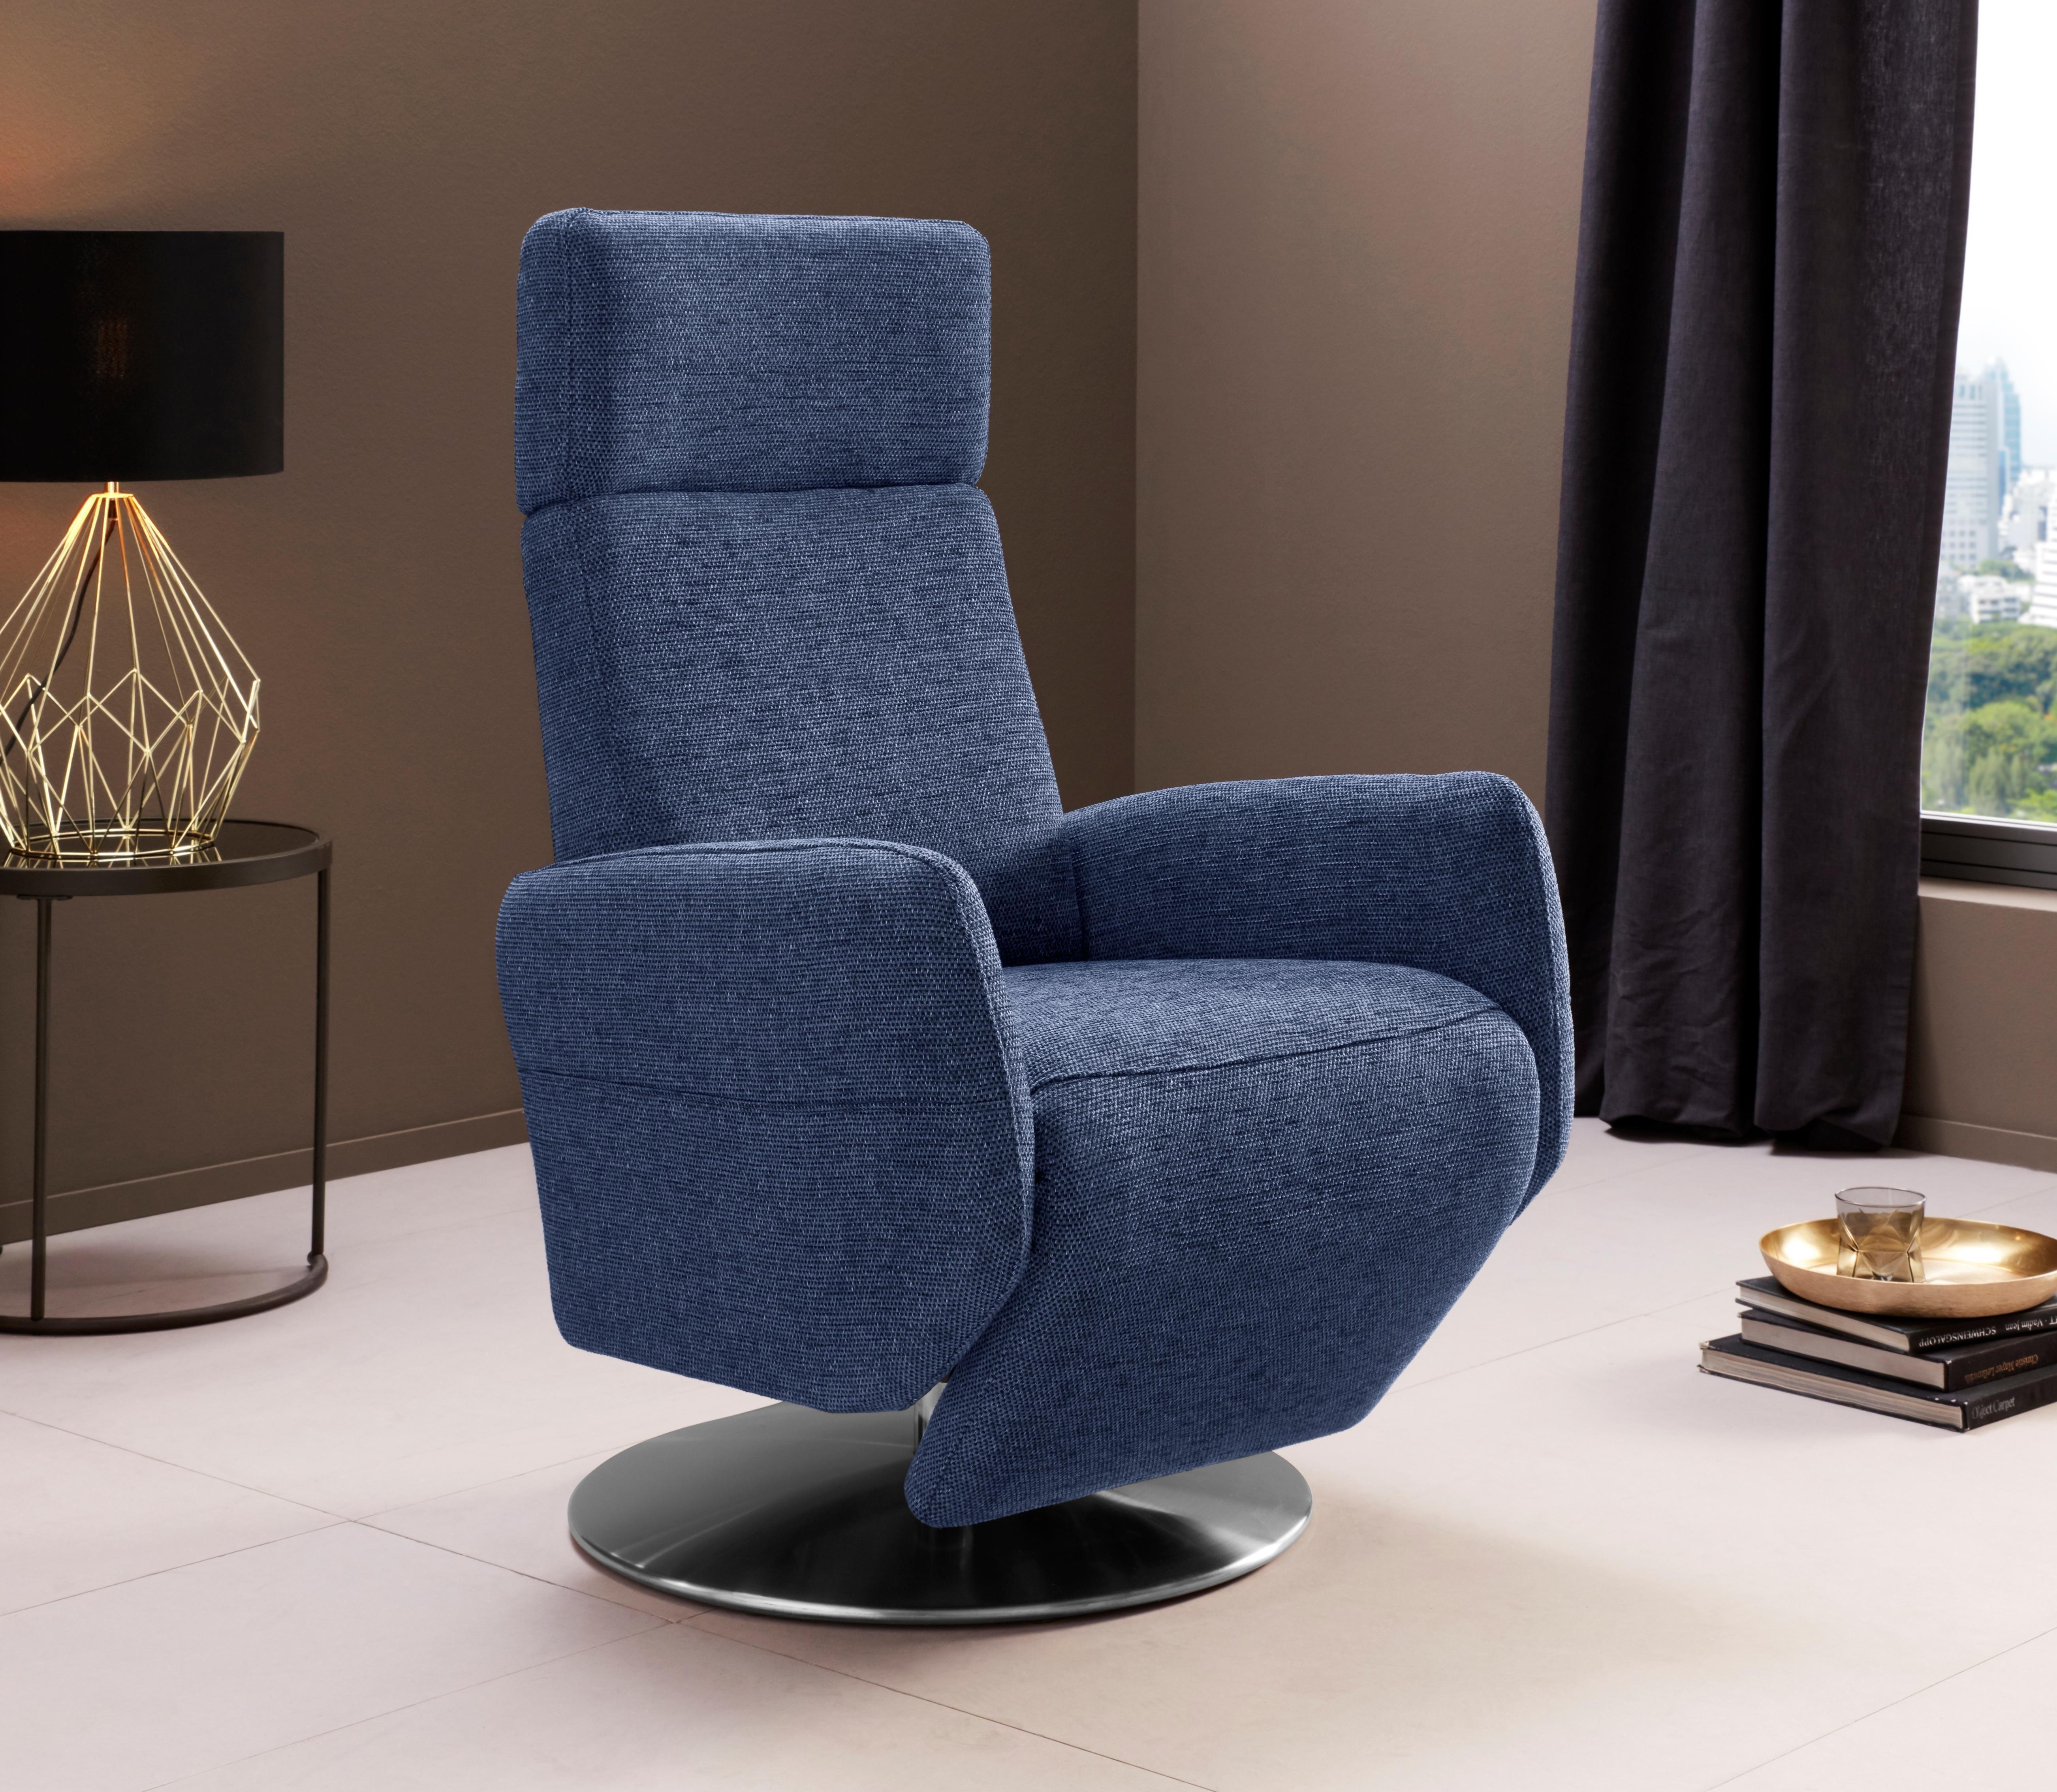 Relaxsessel Leder Beige Mit Hocker Ohrensessel Beziehen Fernsehsessel Elektrisch Leder Hukla Relaxsessel Design Sessel Mit Hocker Fernsehsessel Sessel